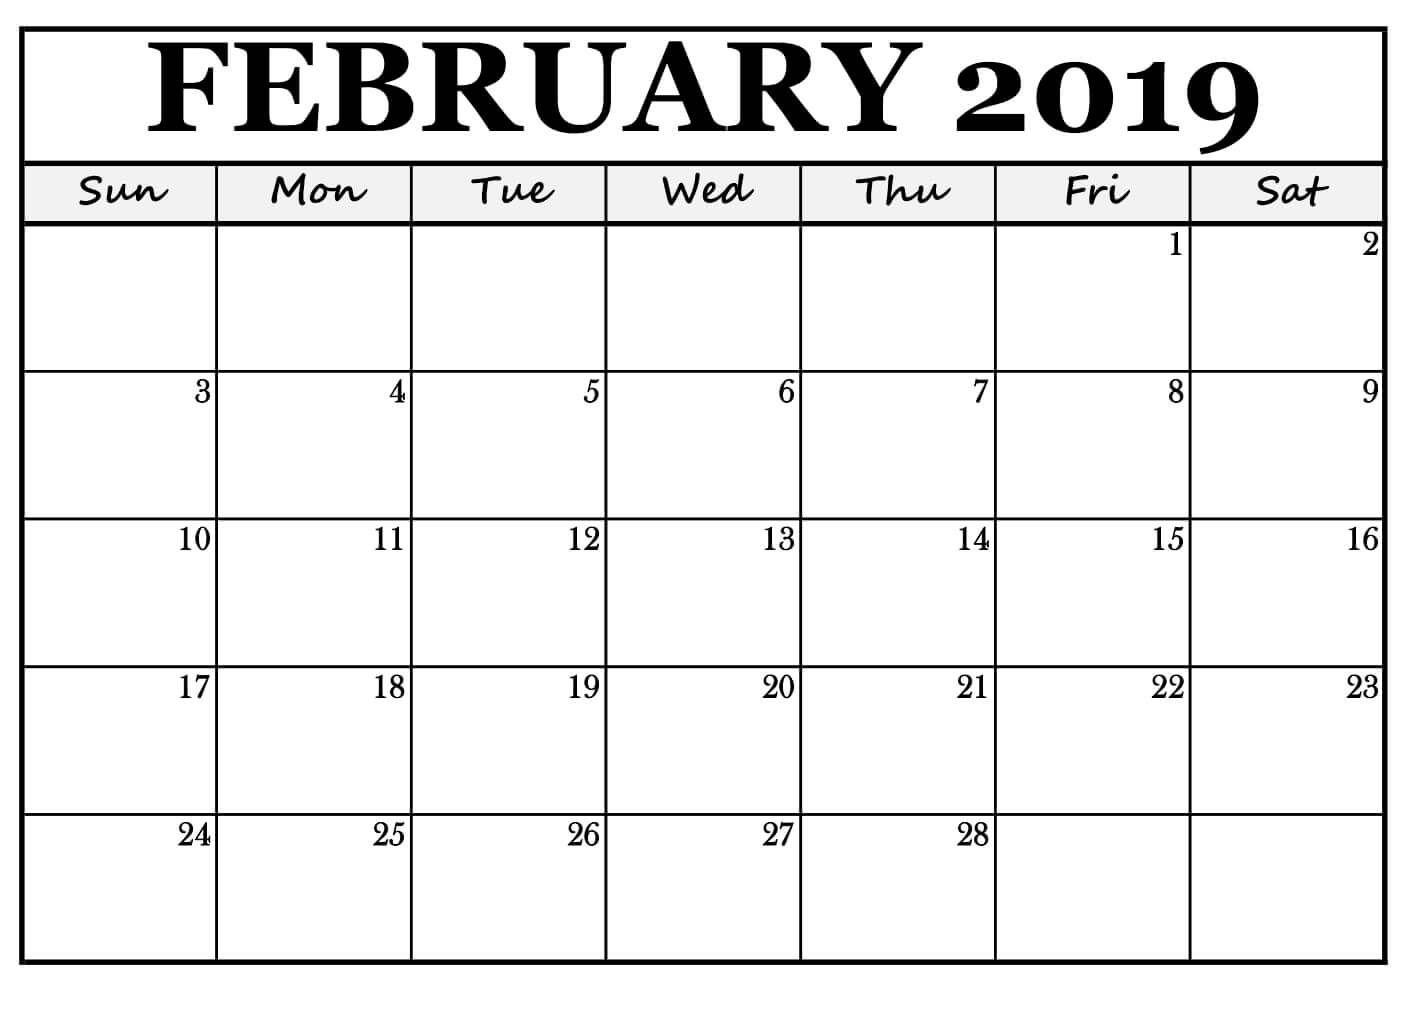 February 2019 Calendar For Office Use Free Printable February 2019